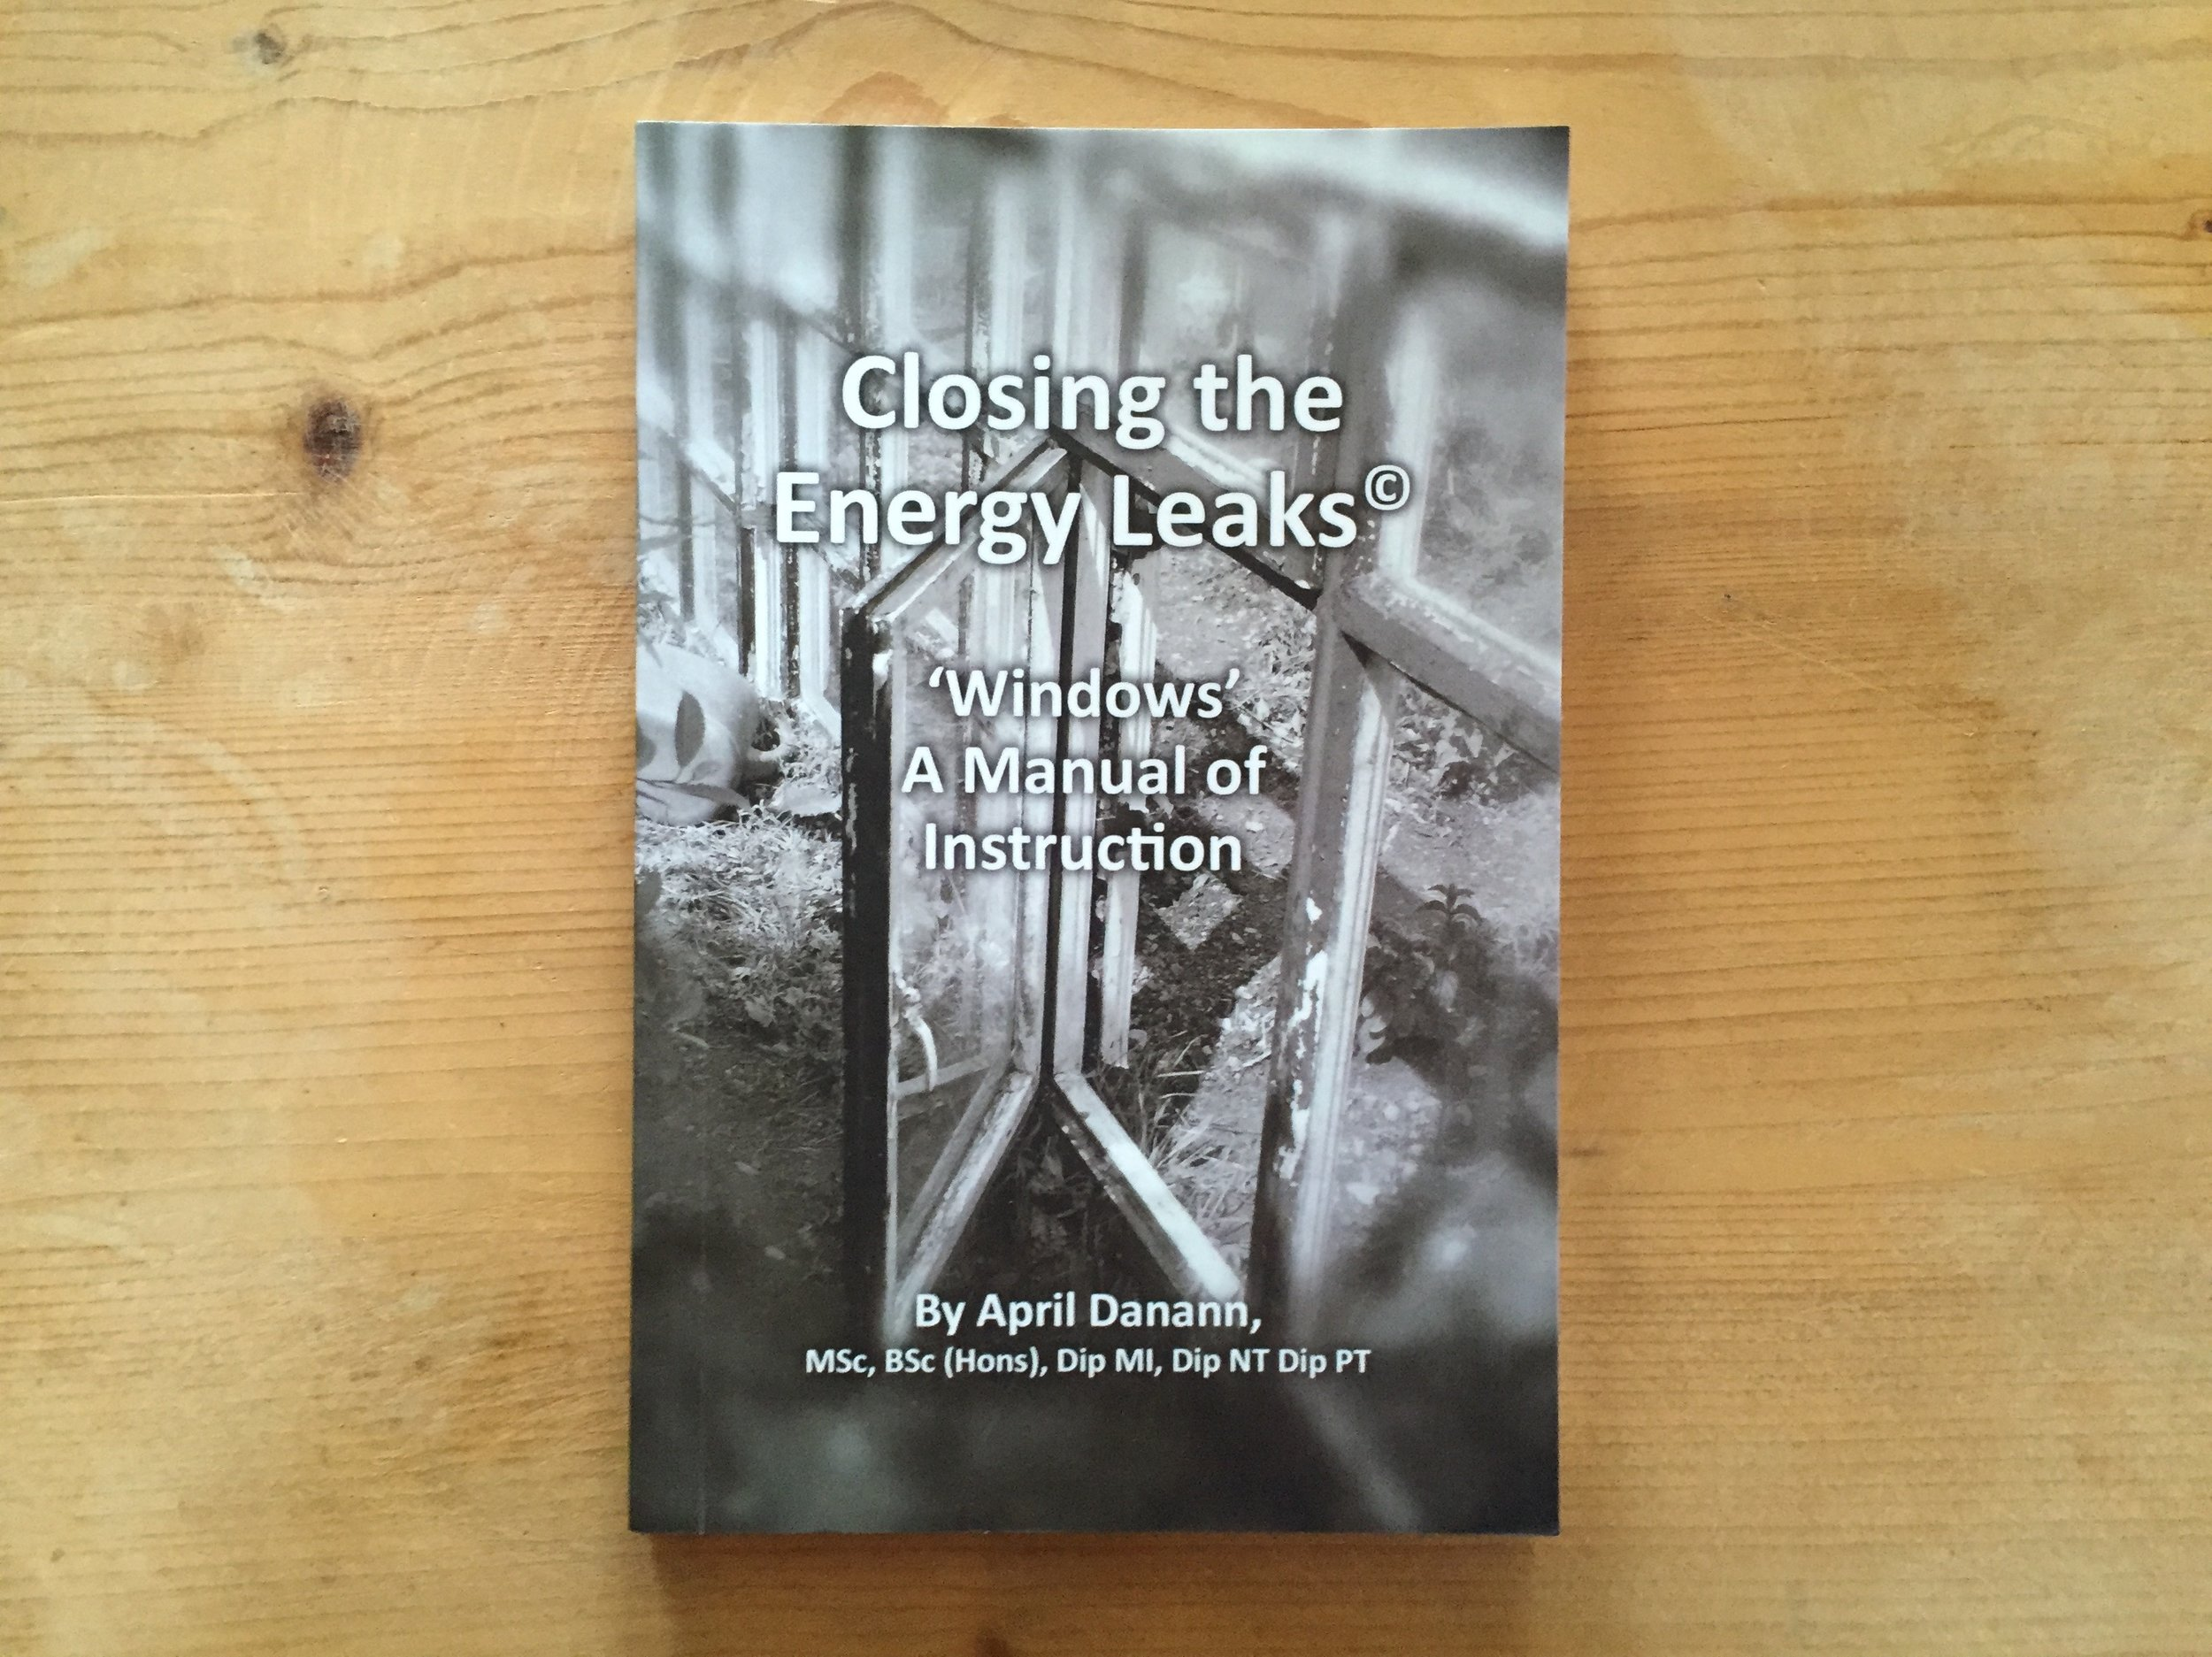 aprildanann-closing-the-energy-leaks.jpg